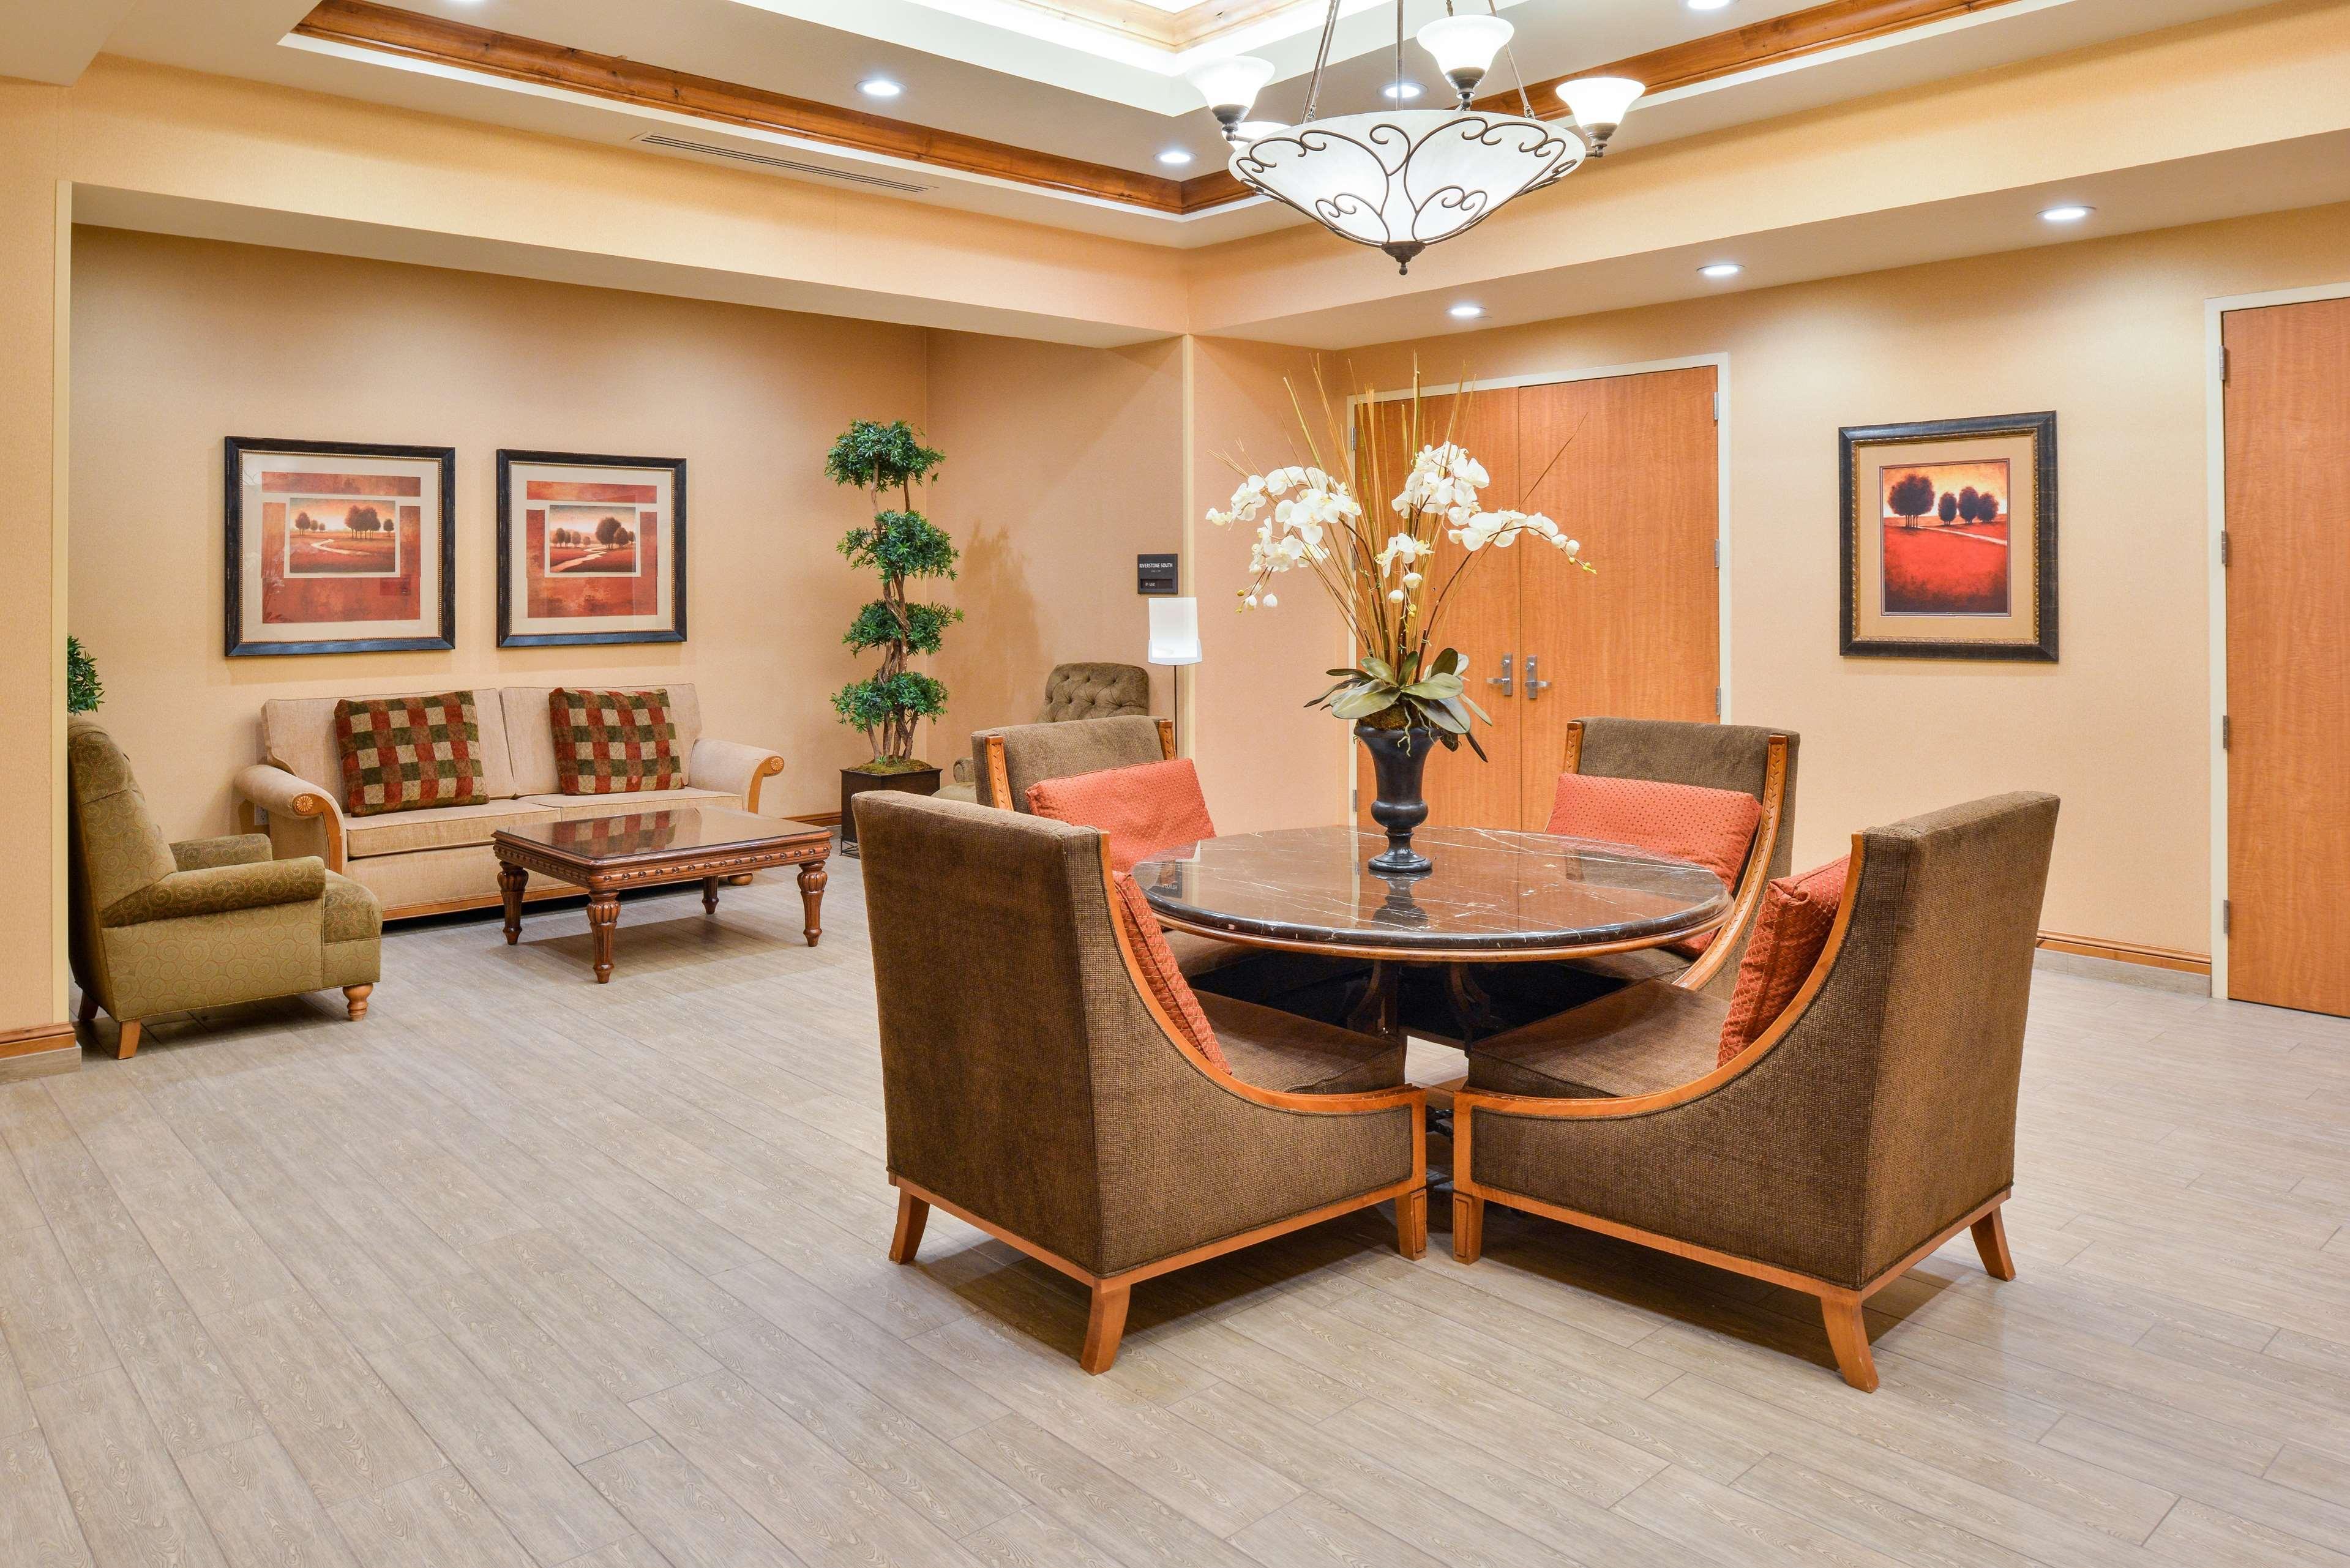 Hampton Inn & Suites Coeur d' Alene image 28